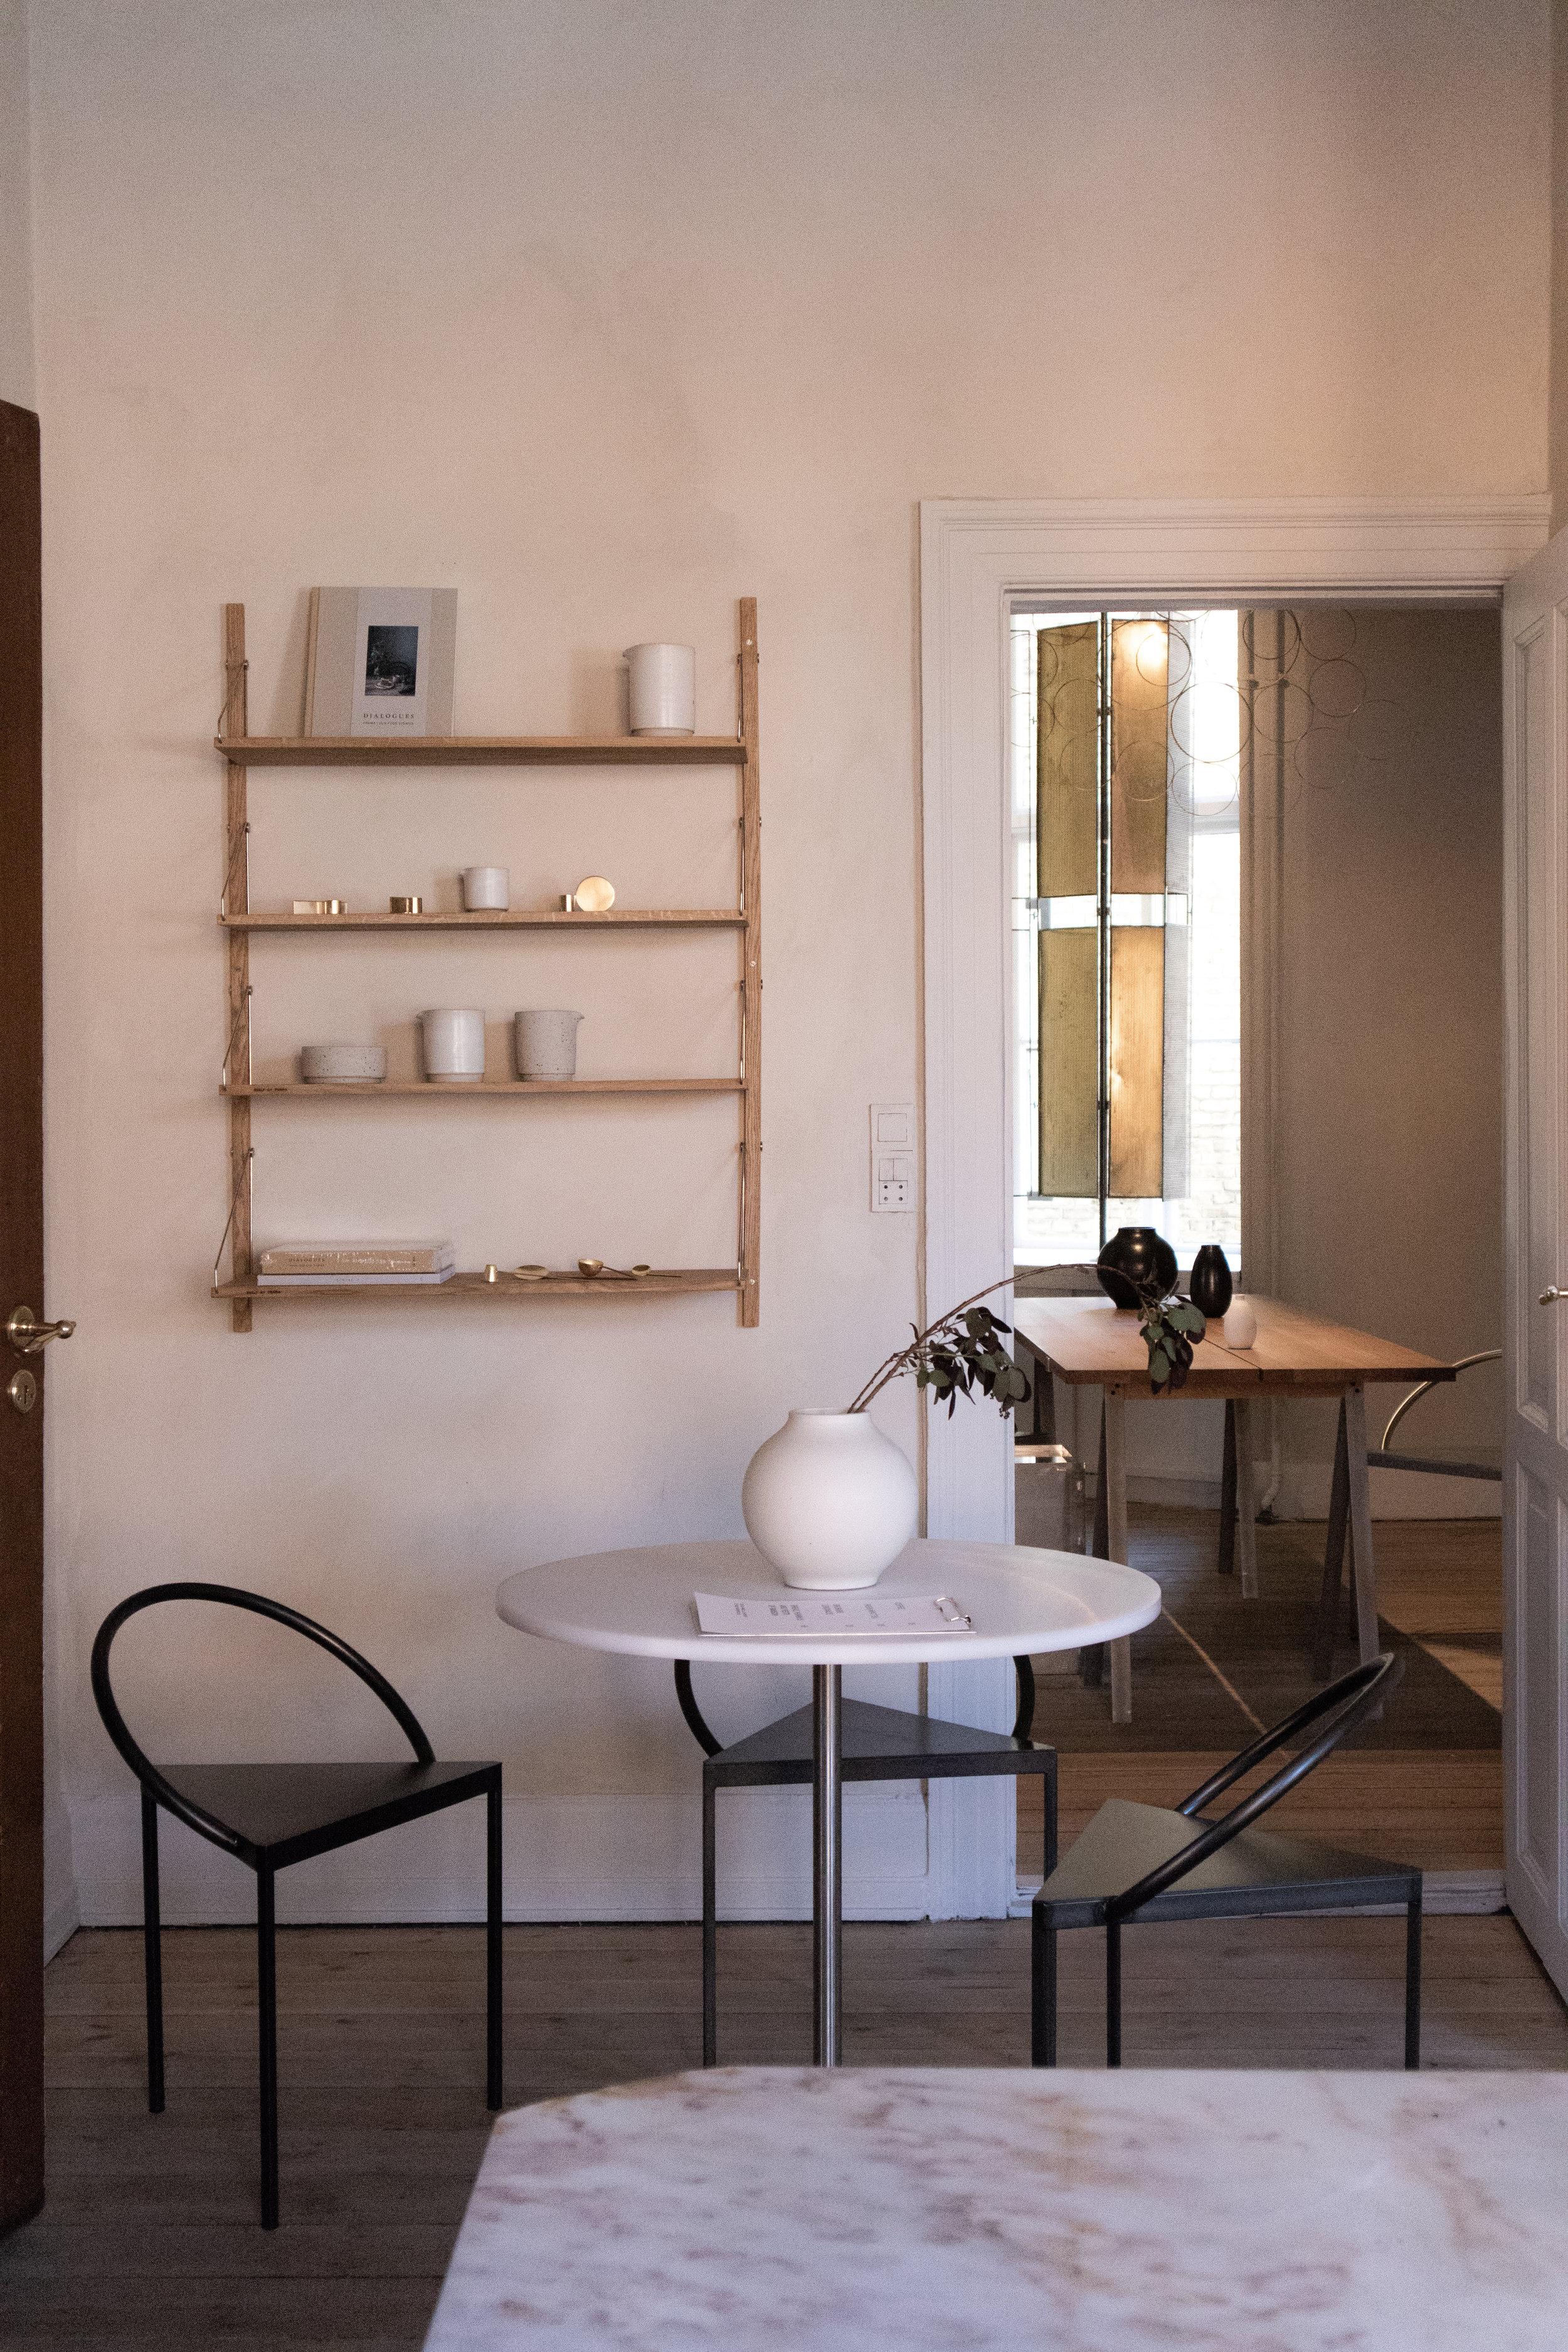 frama apothecary copenhagen store, interiors, scandinavian design 13.jpg